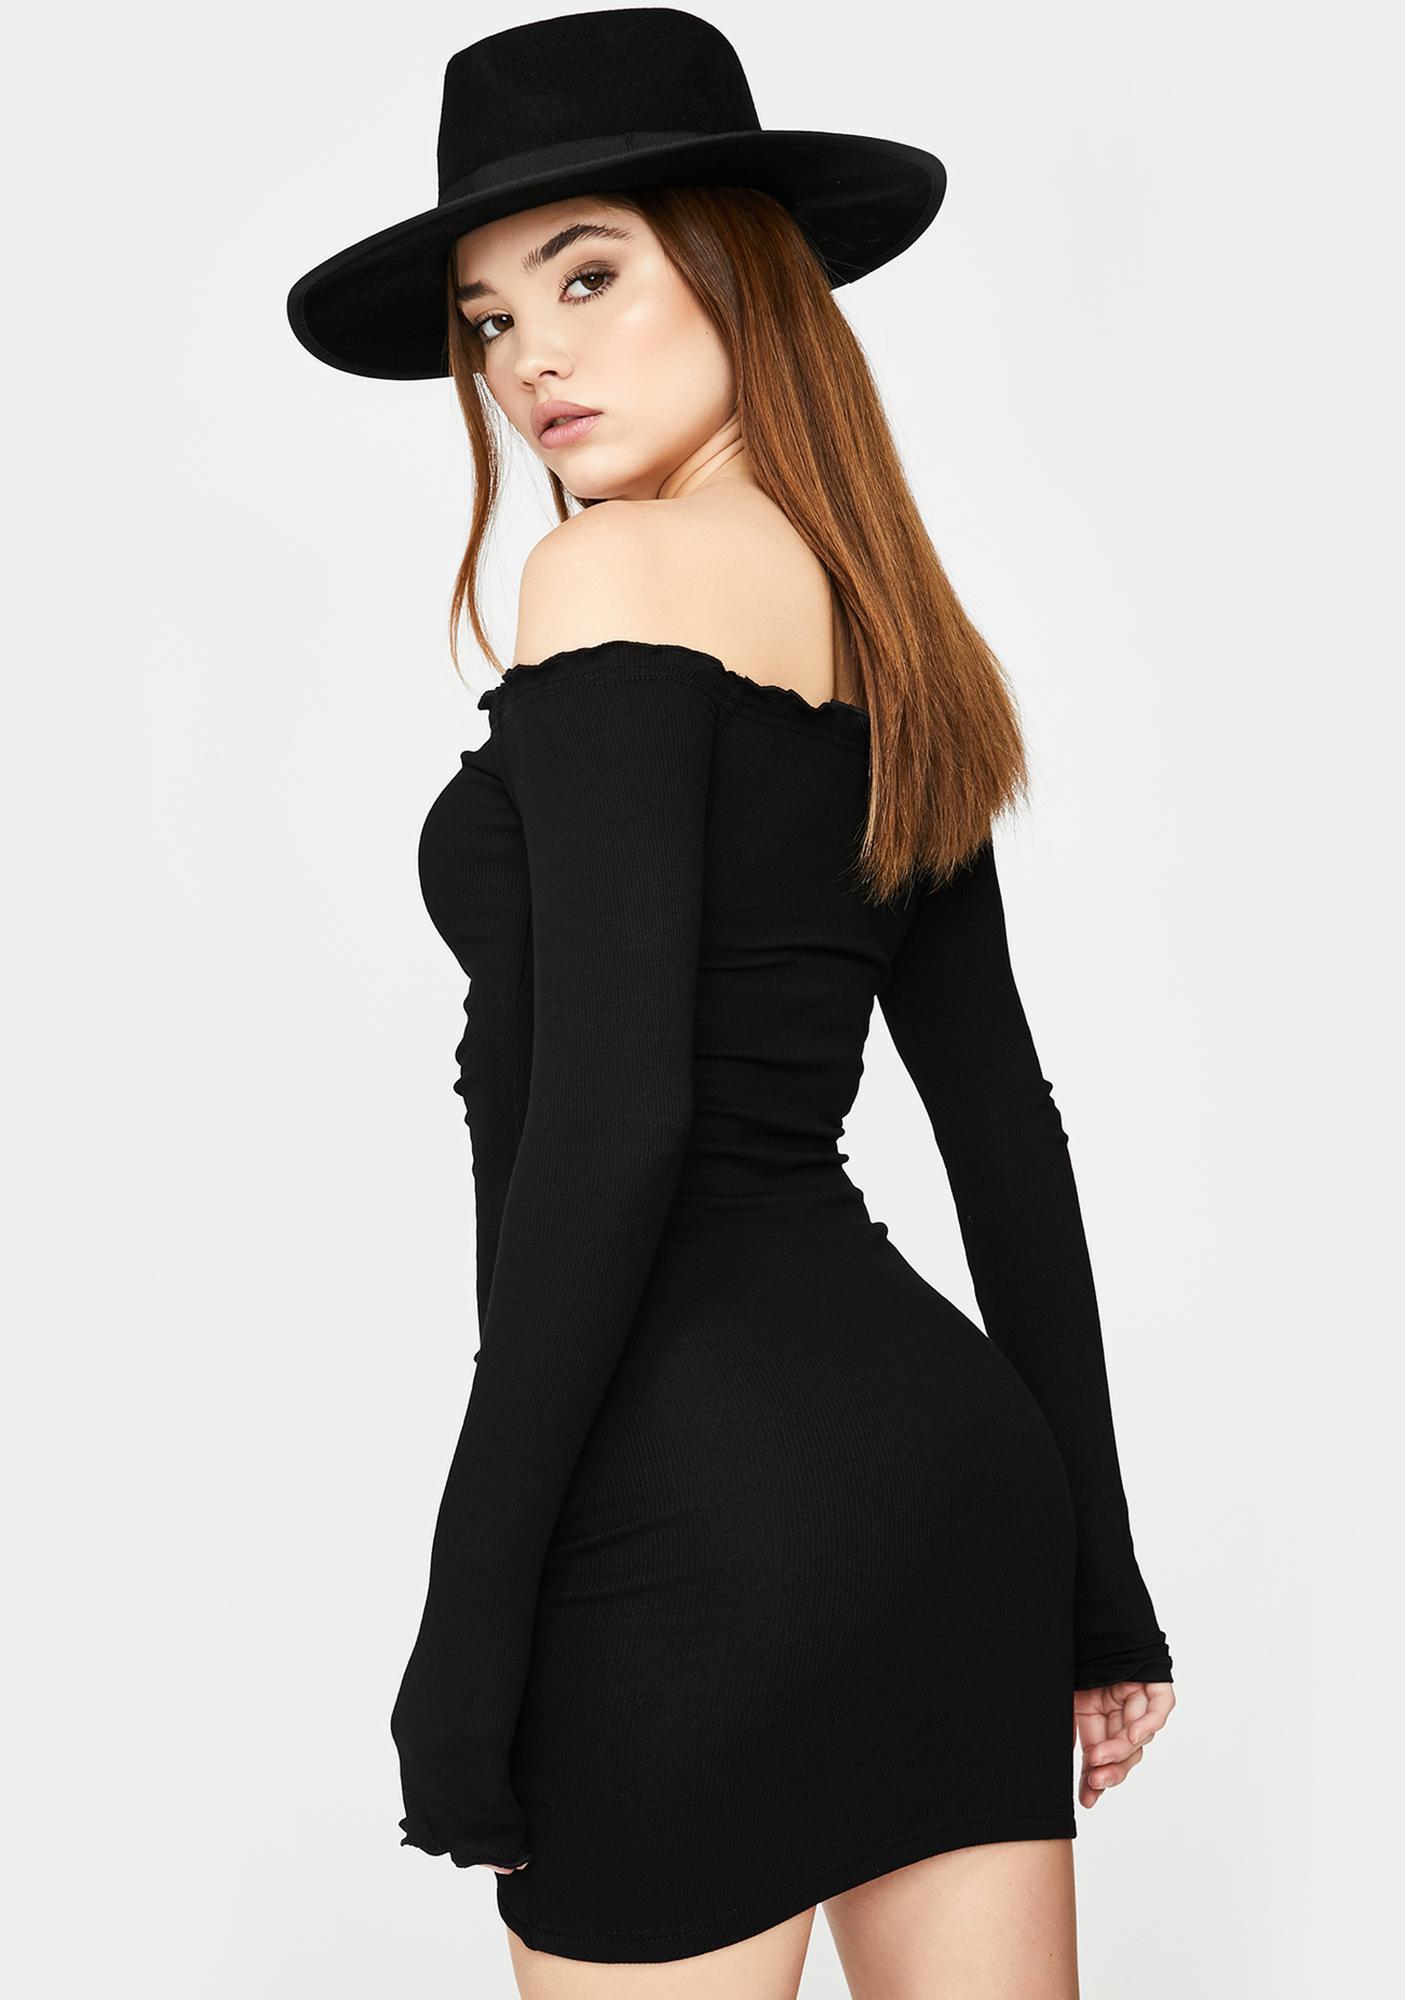 SNDYS. THE LABEL Black Angels Ruched Mini Dress